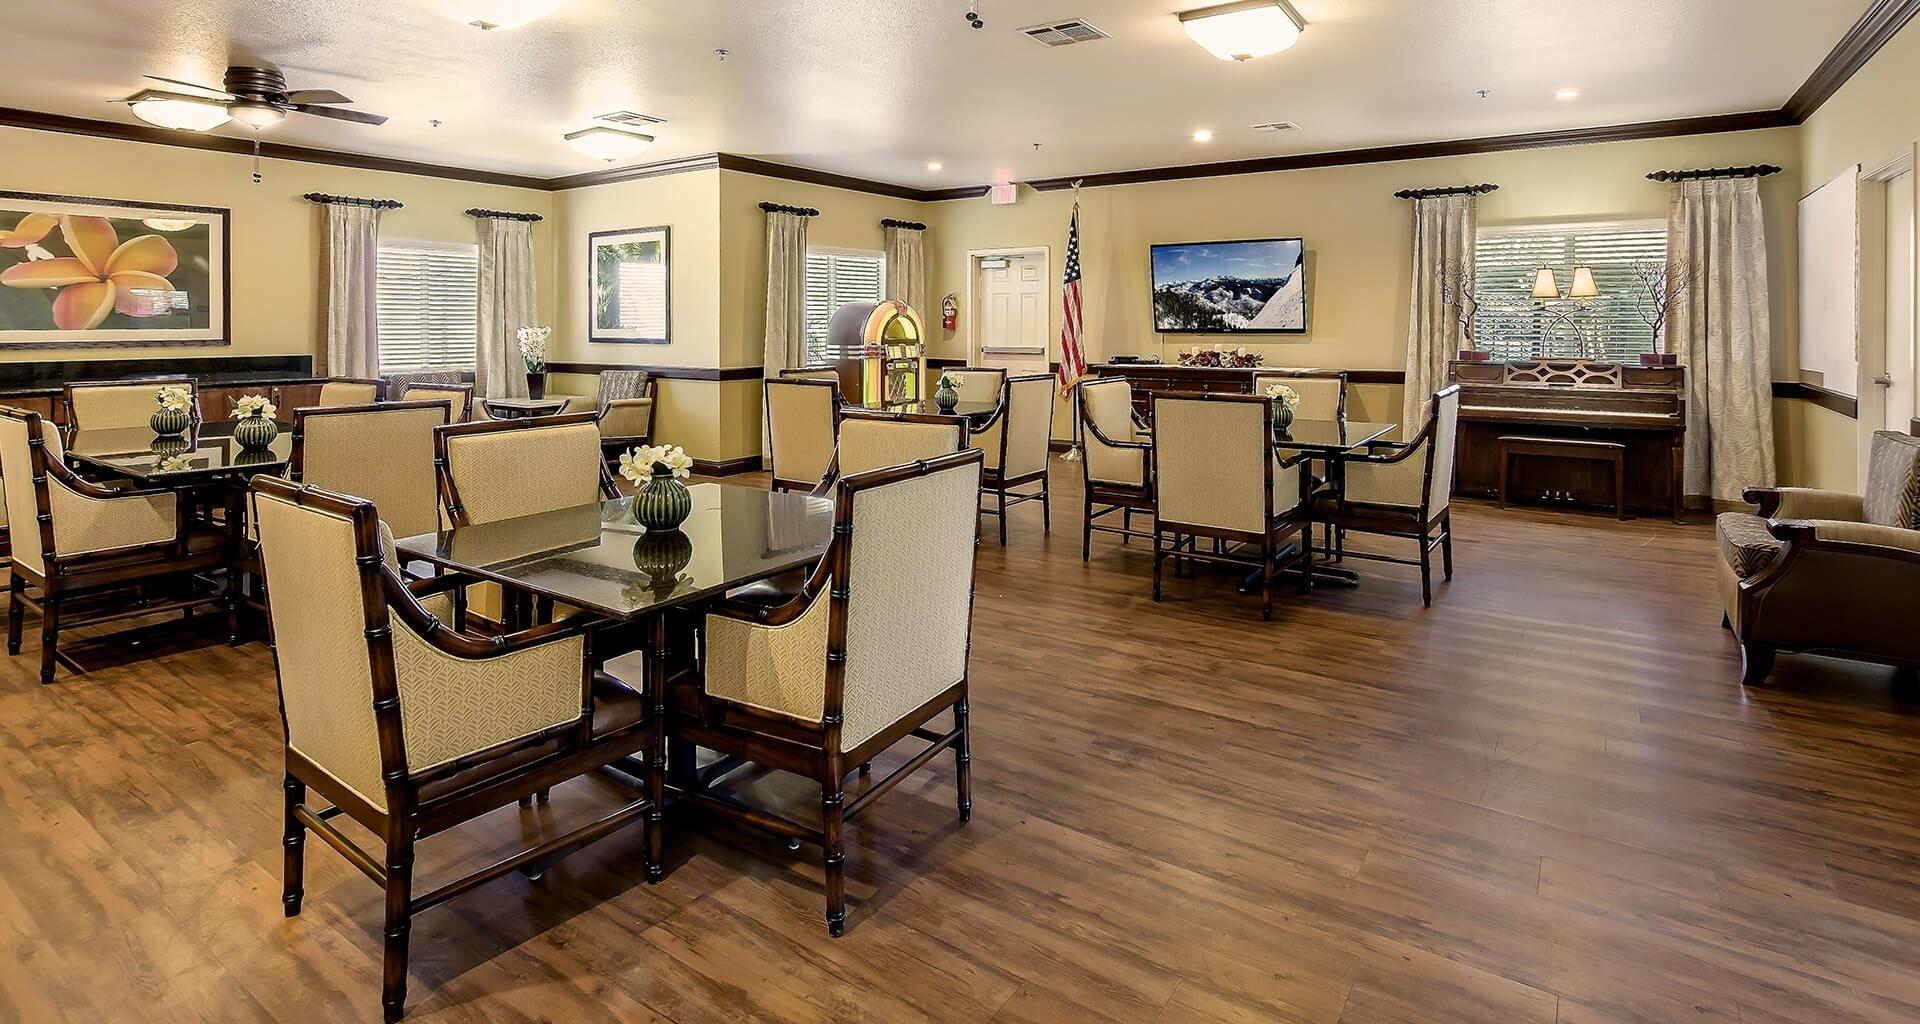 Well Balanced Social Calendar and Formal Dining Room at Pacifica Senior Living: Riverside Legacies Memory Care, Riverside, 92509